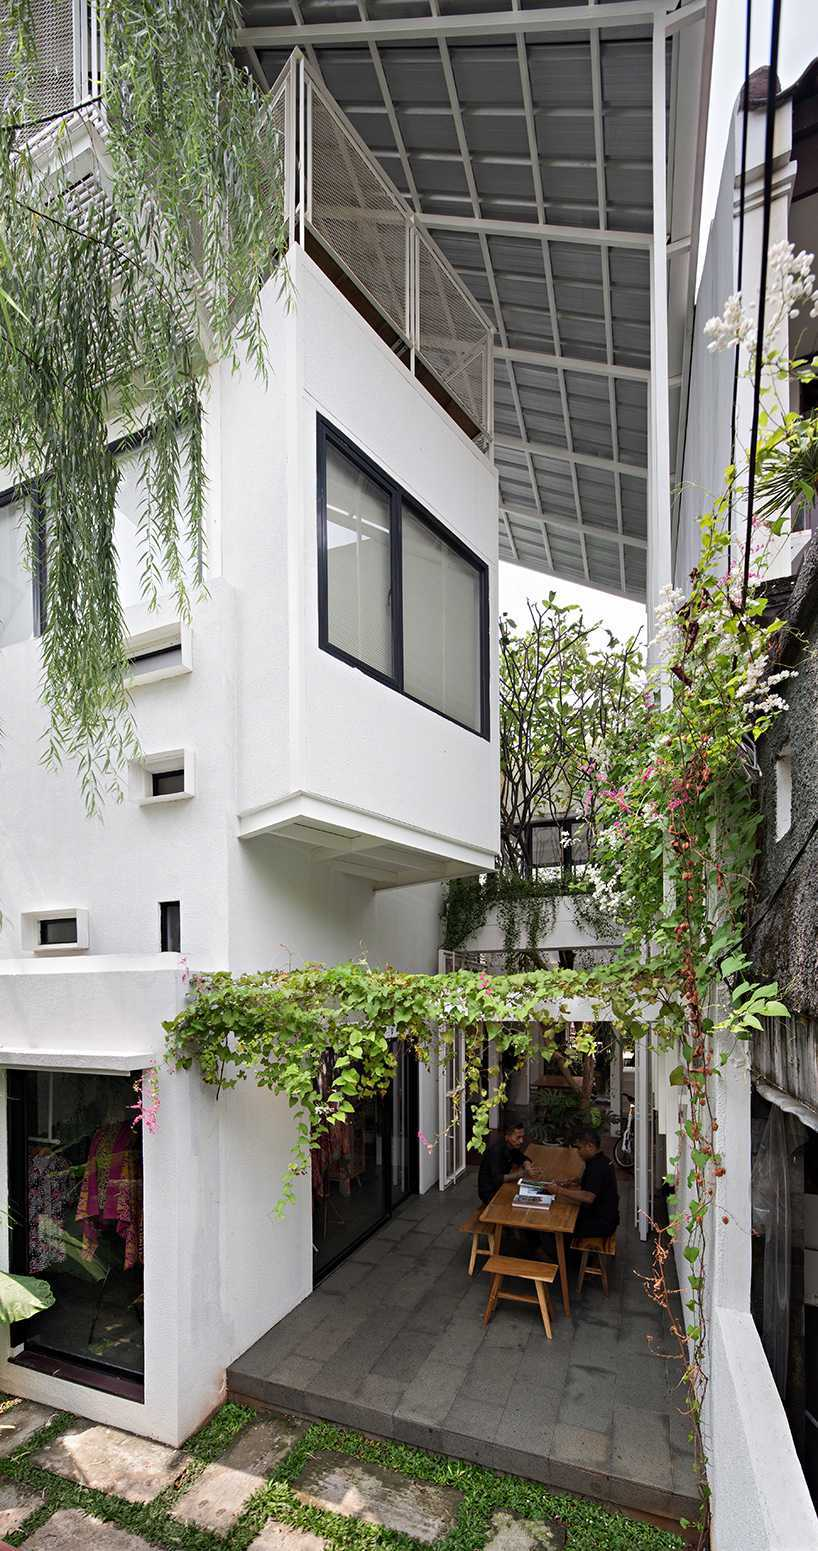 Kontras fungsi Rumah Gerbong sebagai area tempat tinggal dan bekerja diredam sempurna dengan adanya area sosial/interaksi. Empat kamar tidur, ruang keluarga, kamar mandi, ruang membaca, ruang ibadah, dan ruang servis berada di area tempat tinggal. Sedangkan, area kerja berupa kantor arsitek, butik dan perpustakaan kecil. Kedua area ini disatukan dengan baik oleh amphitheater kecil, dapur bersama, ruang tamu komunal, dan atap hijau sebagai area interaksi.